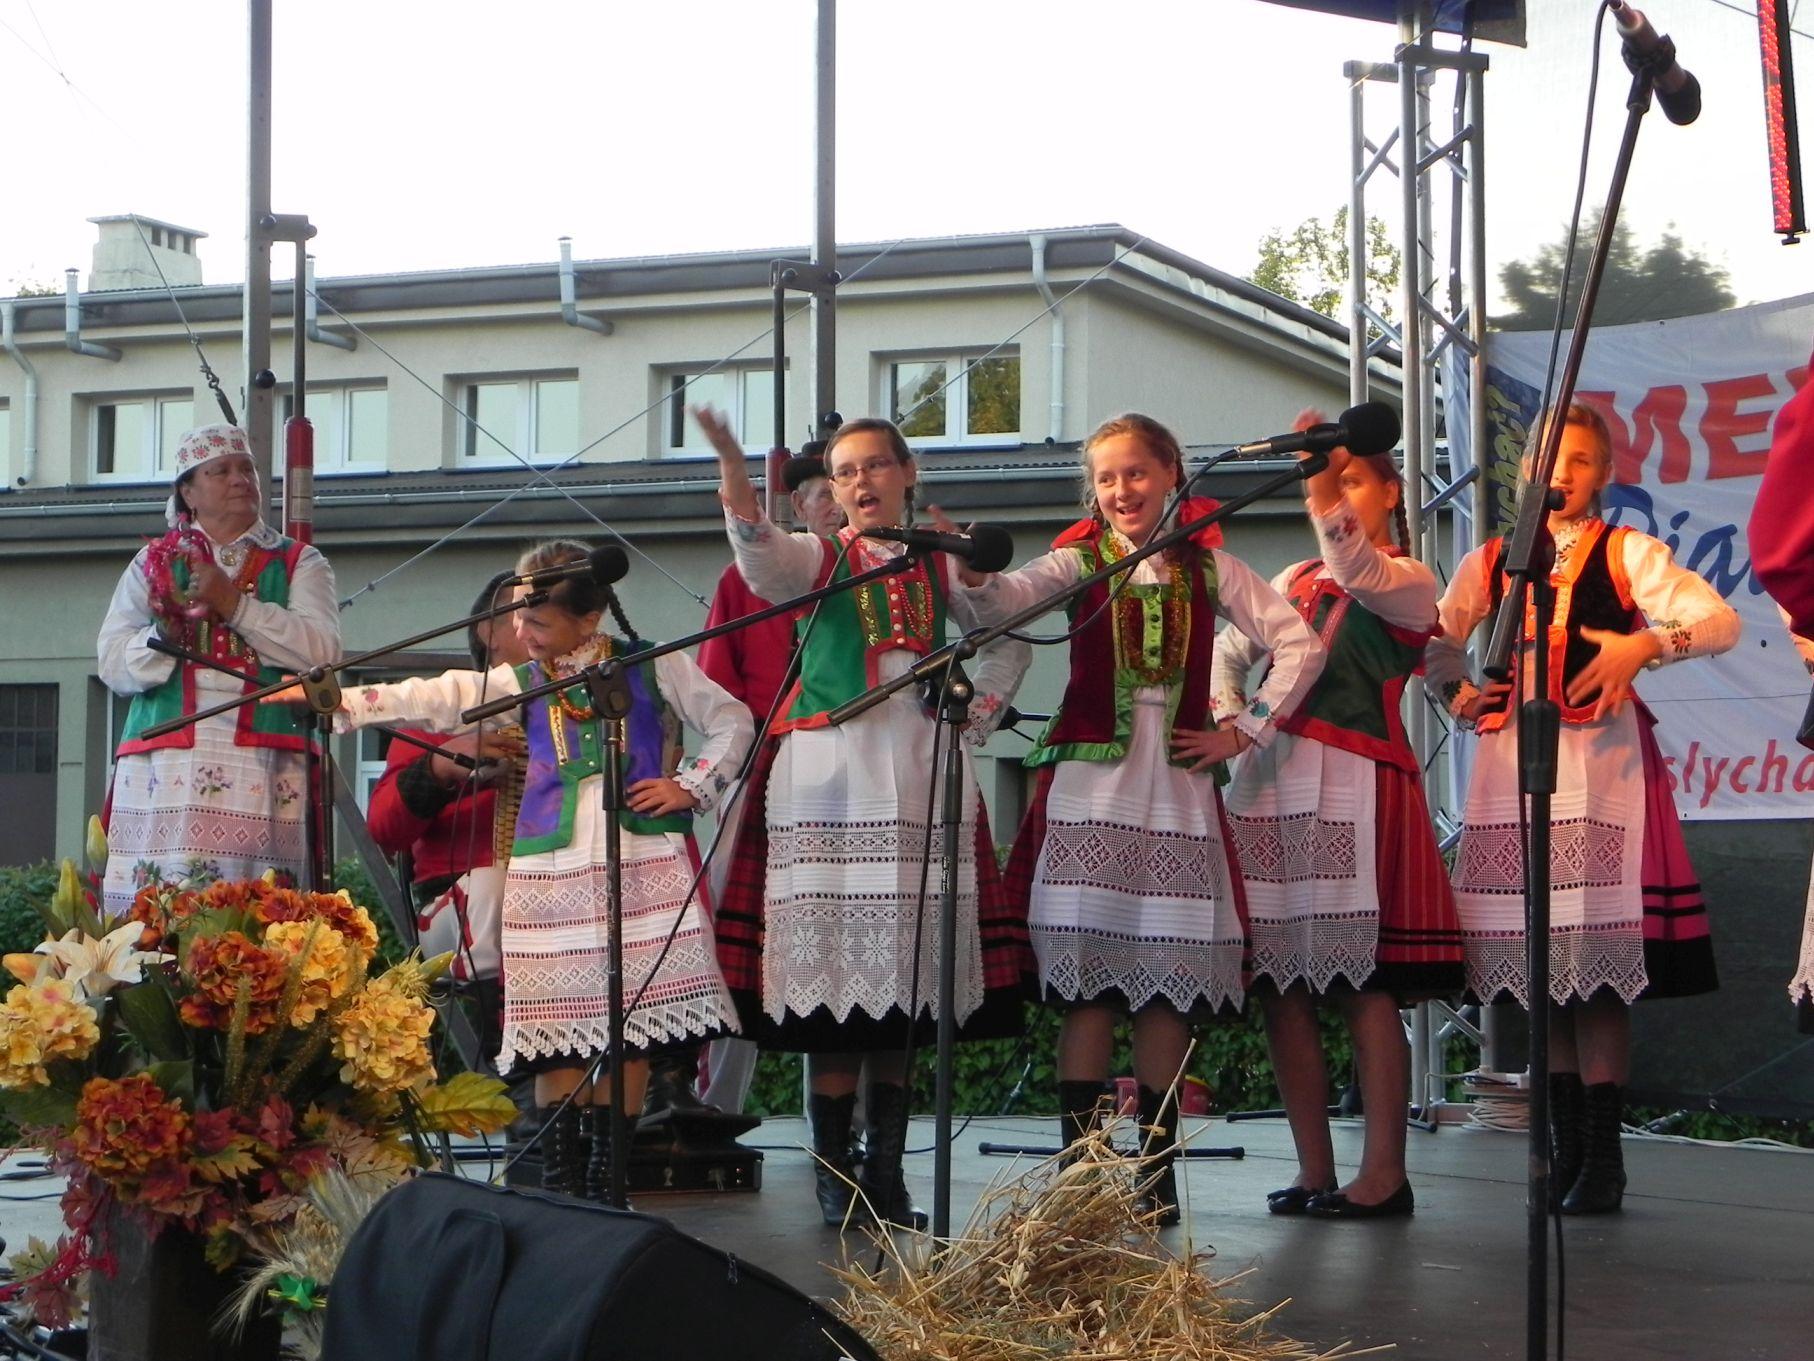 2013-09-10 Festyn - Mińsk Maz (166)